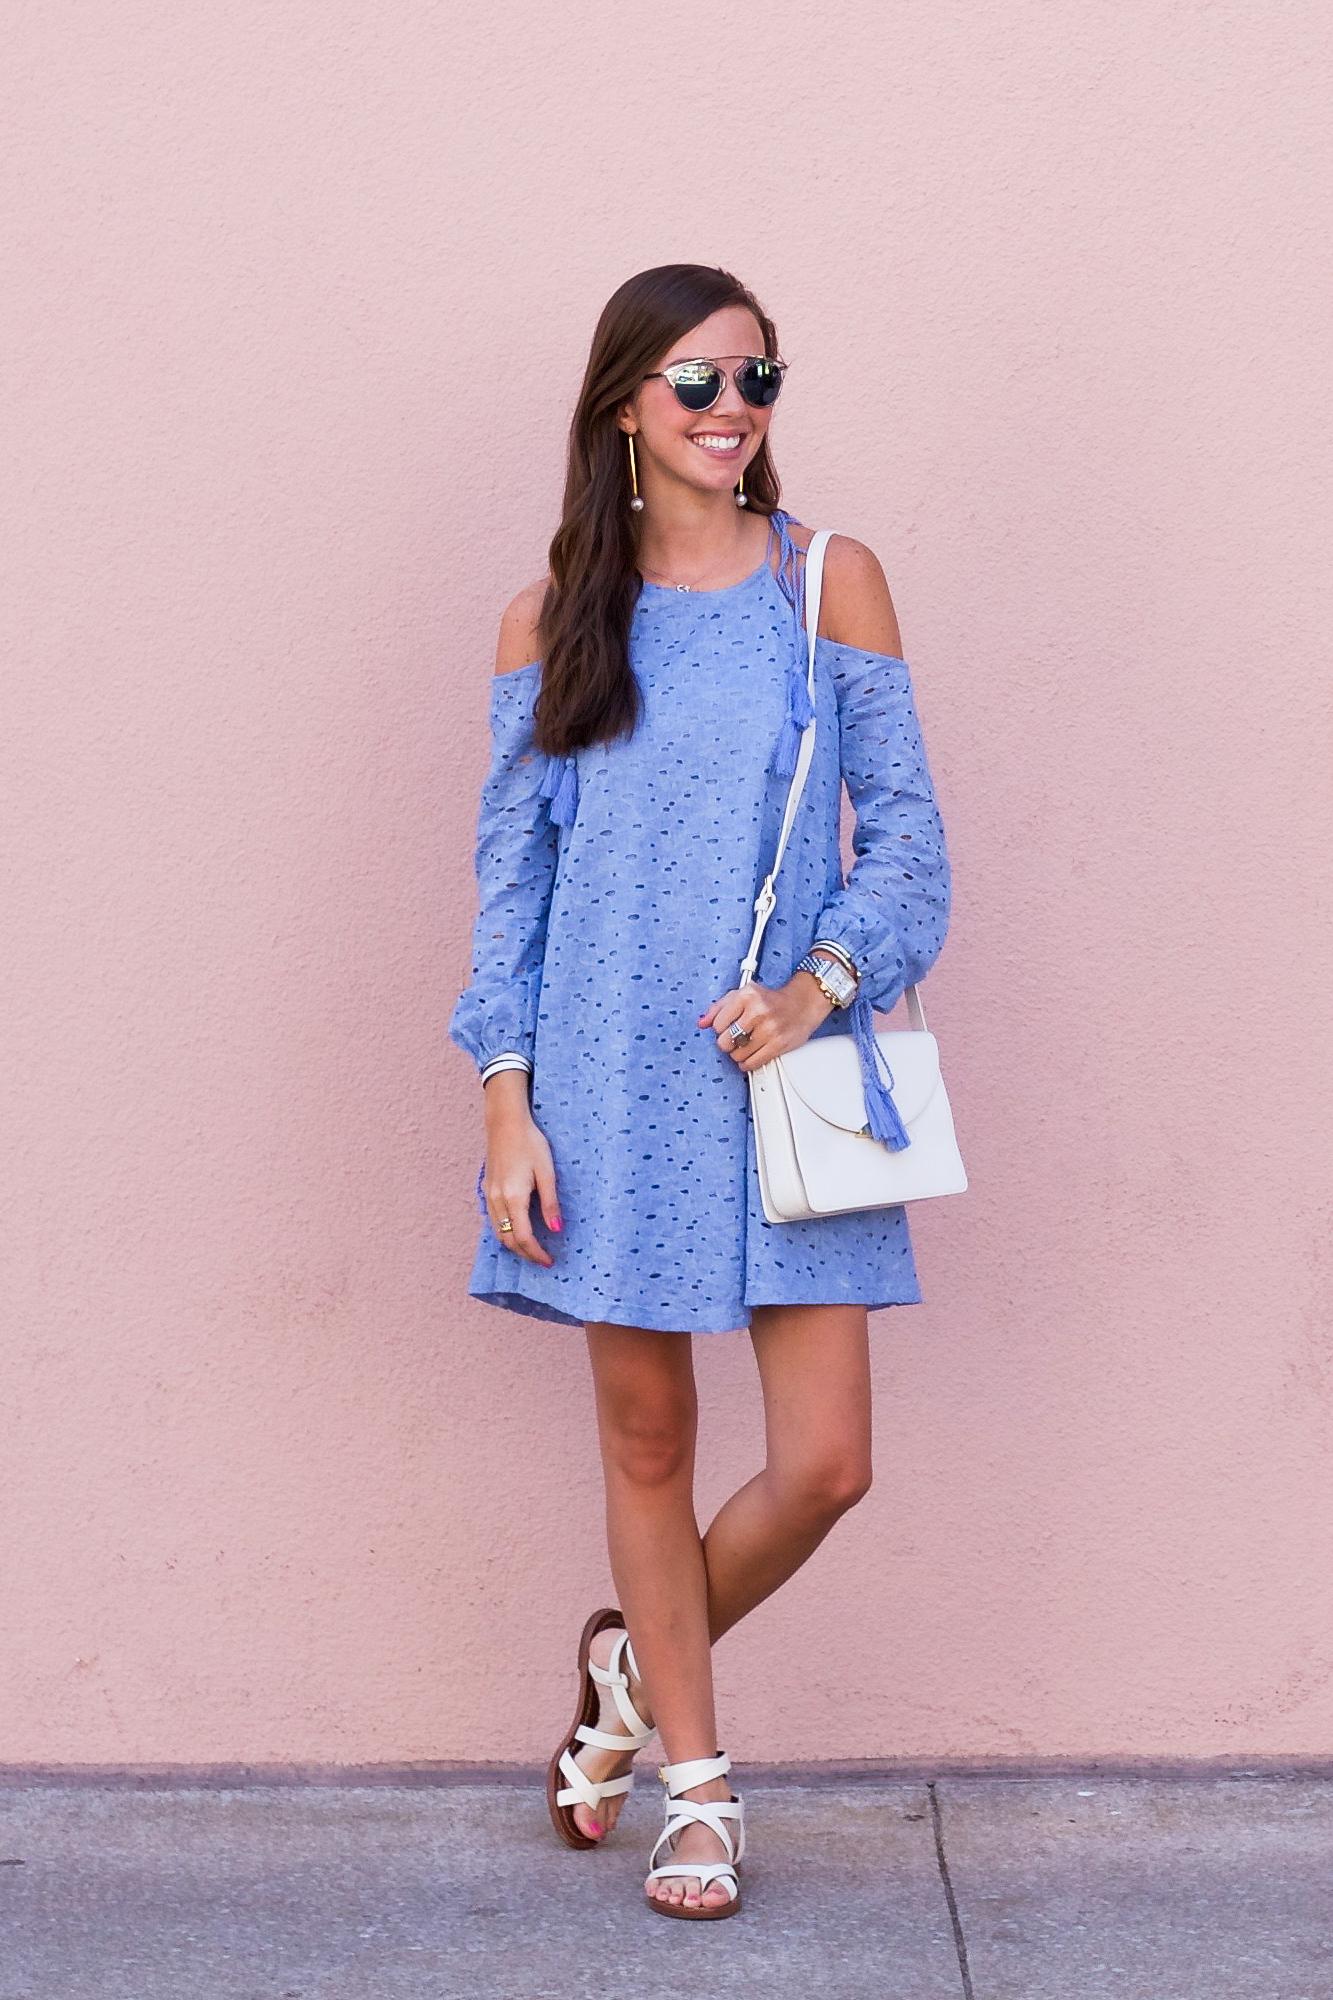 fashion blogger lcb style beach shopbop tory burch charleston  (9 of 13).jpg